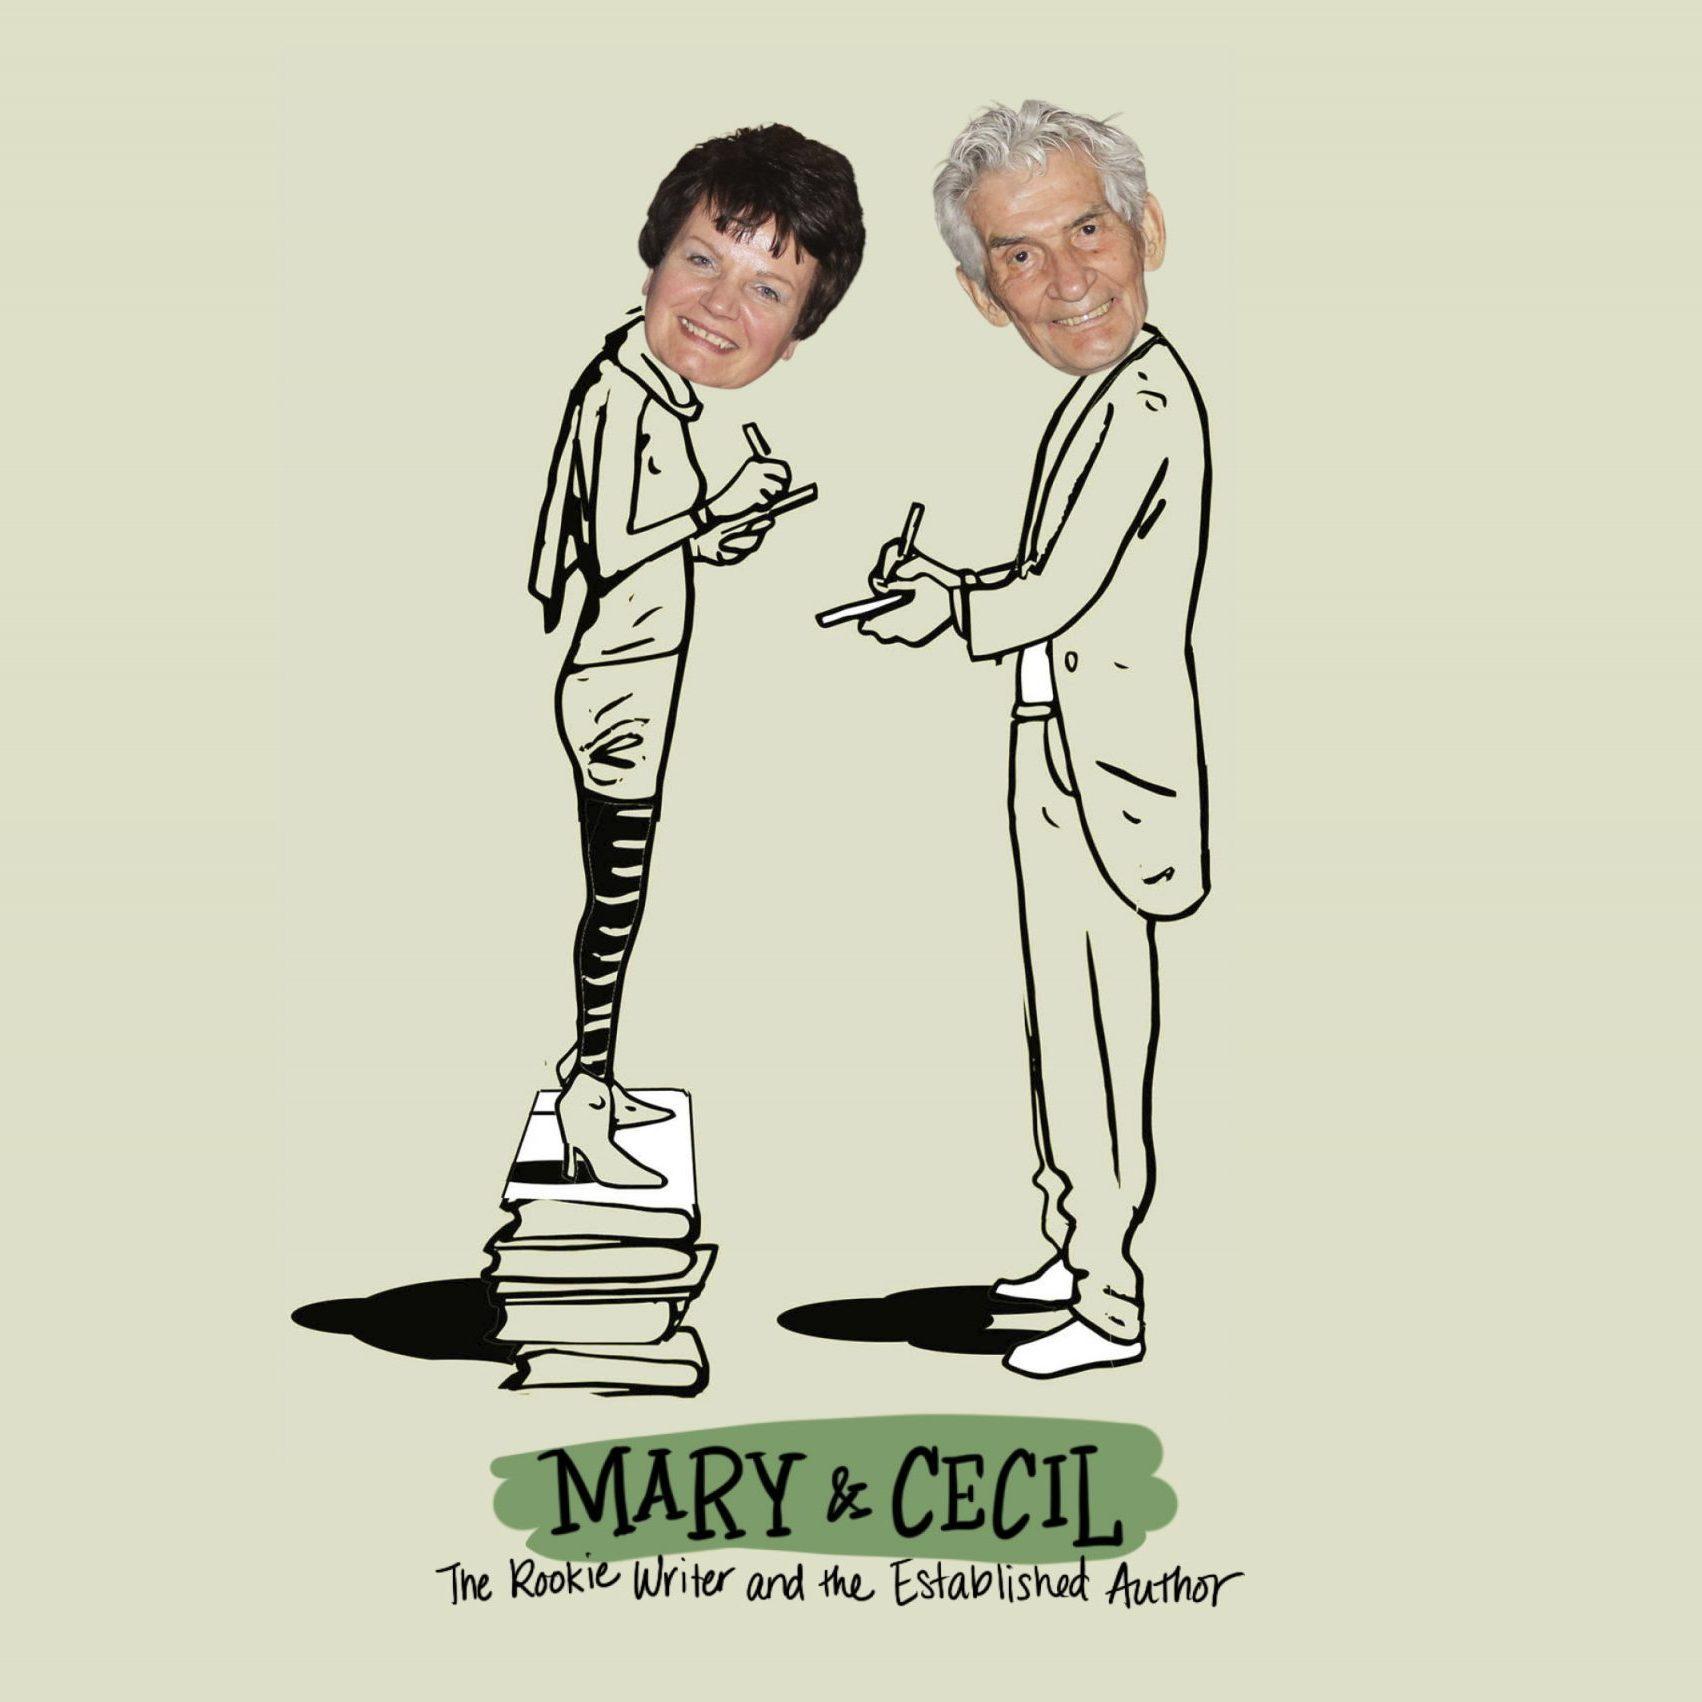 Mary & Cecil